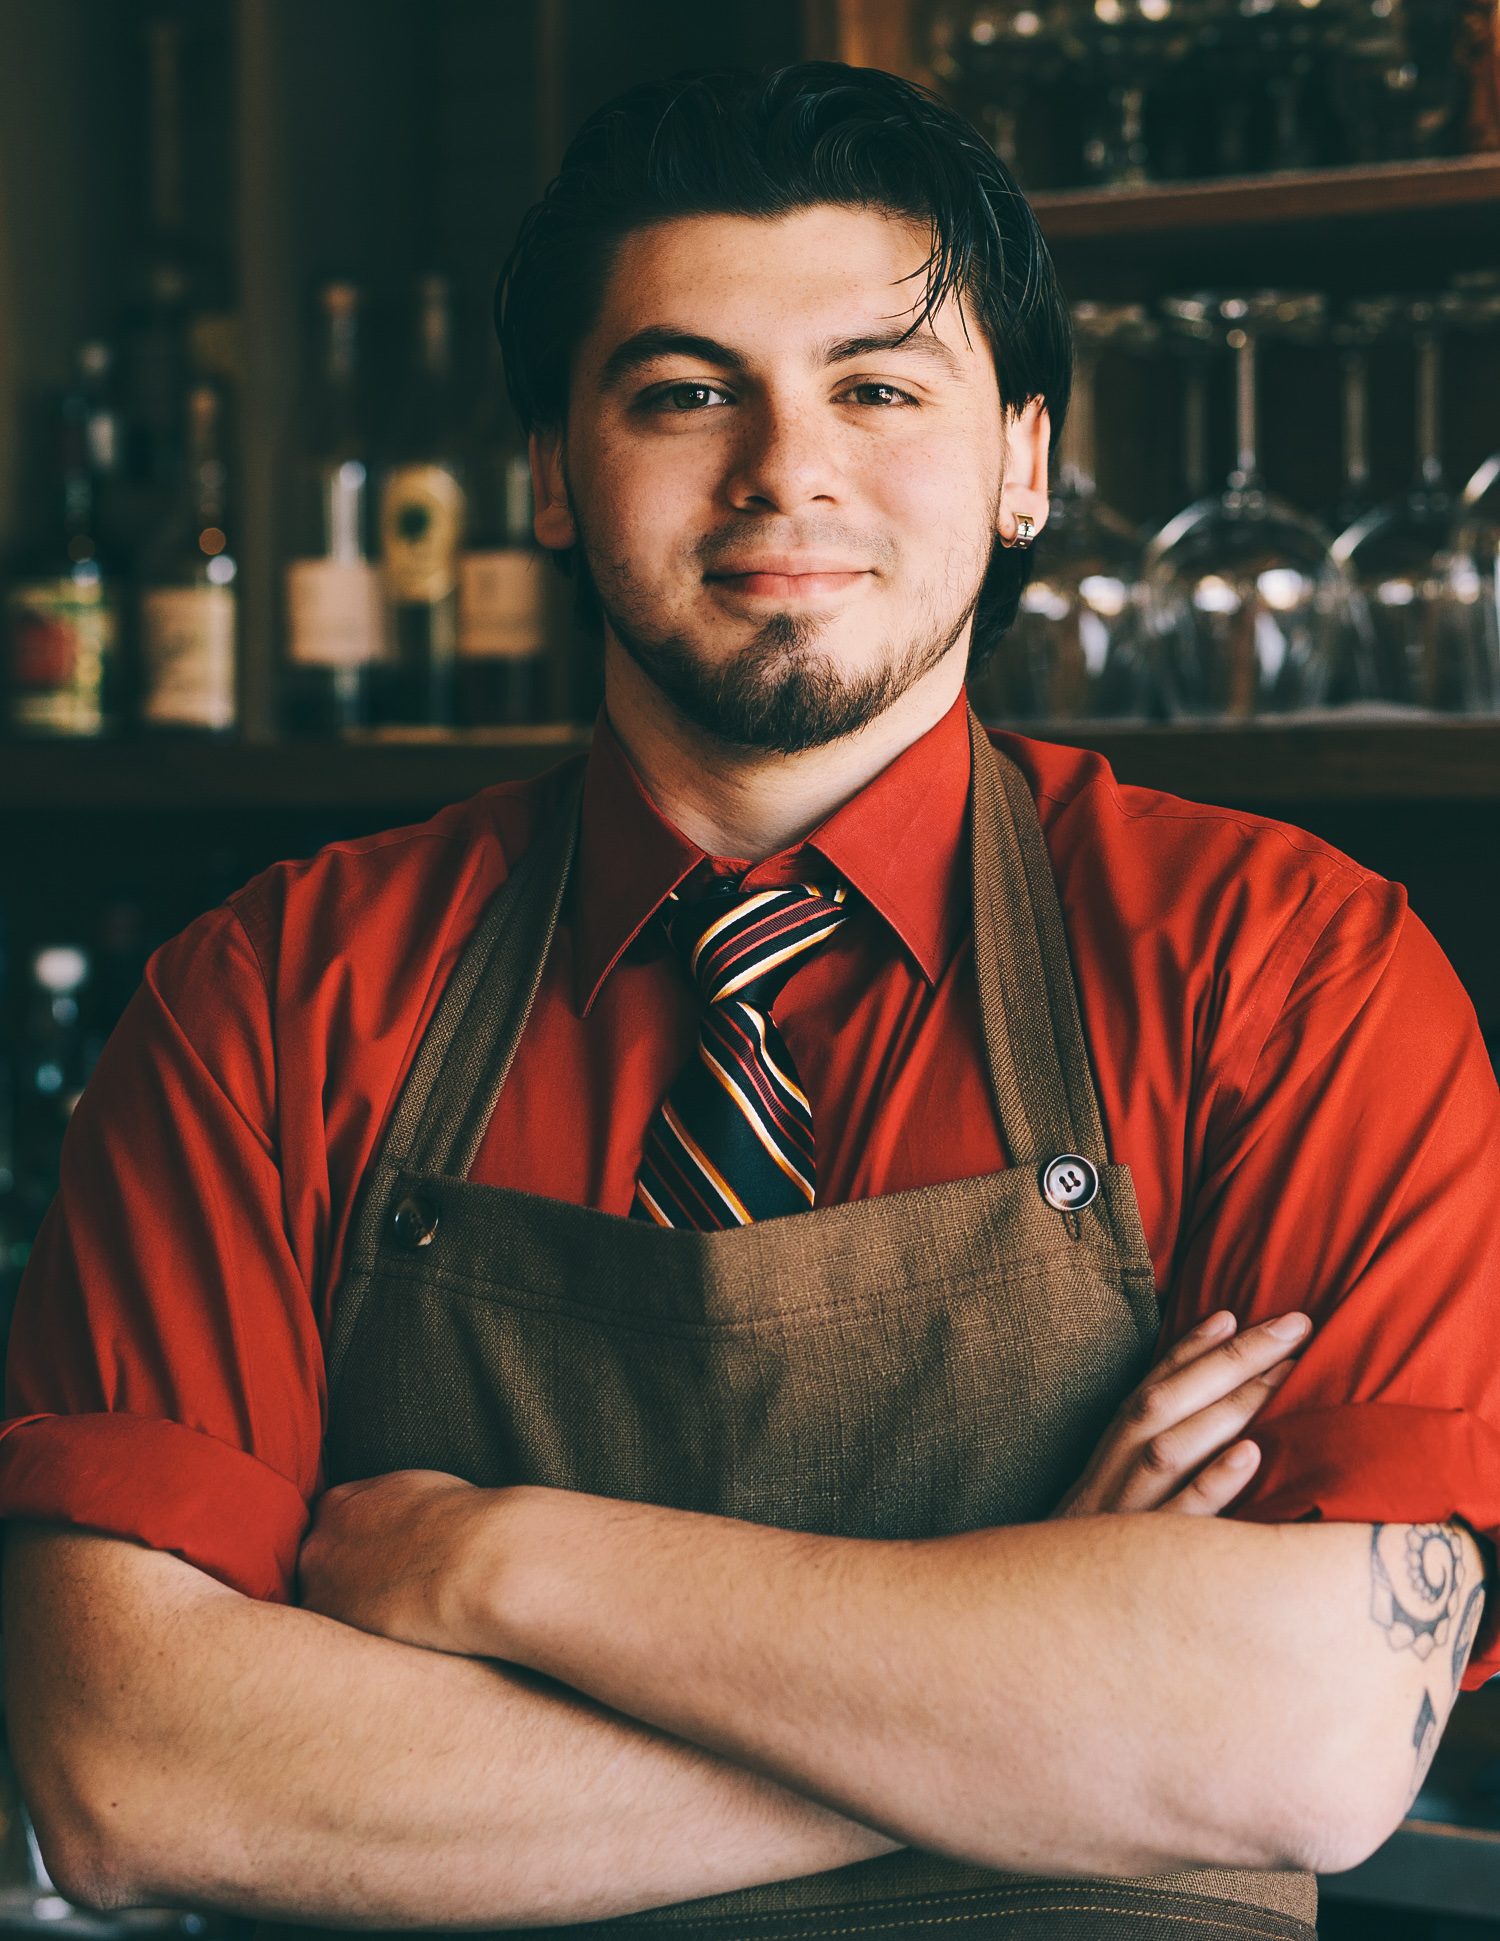 Bartender photographed by Adam DeTour